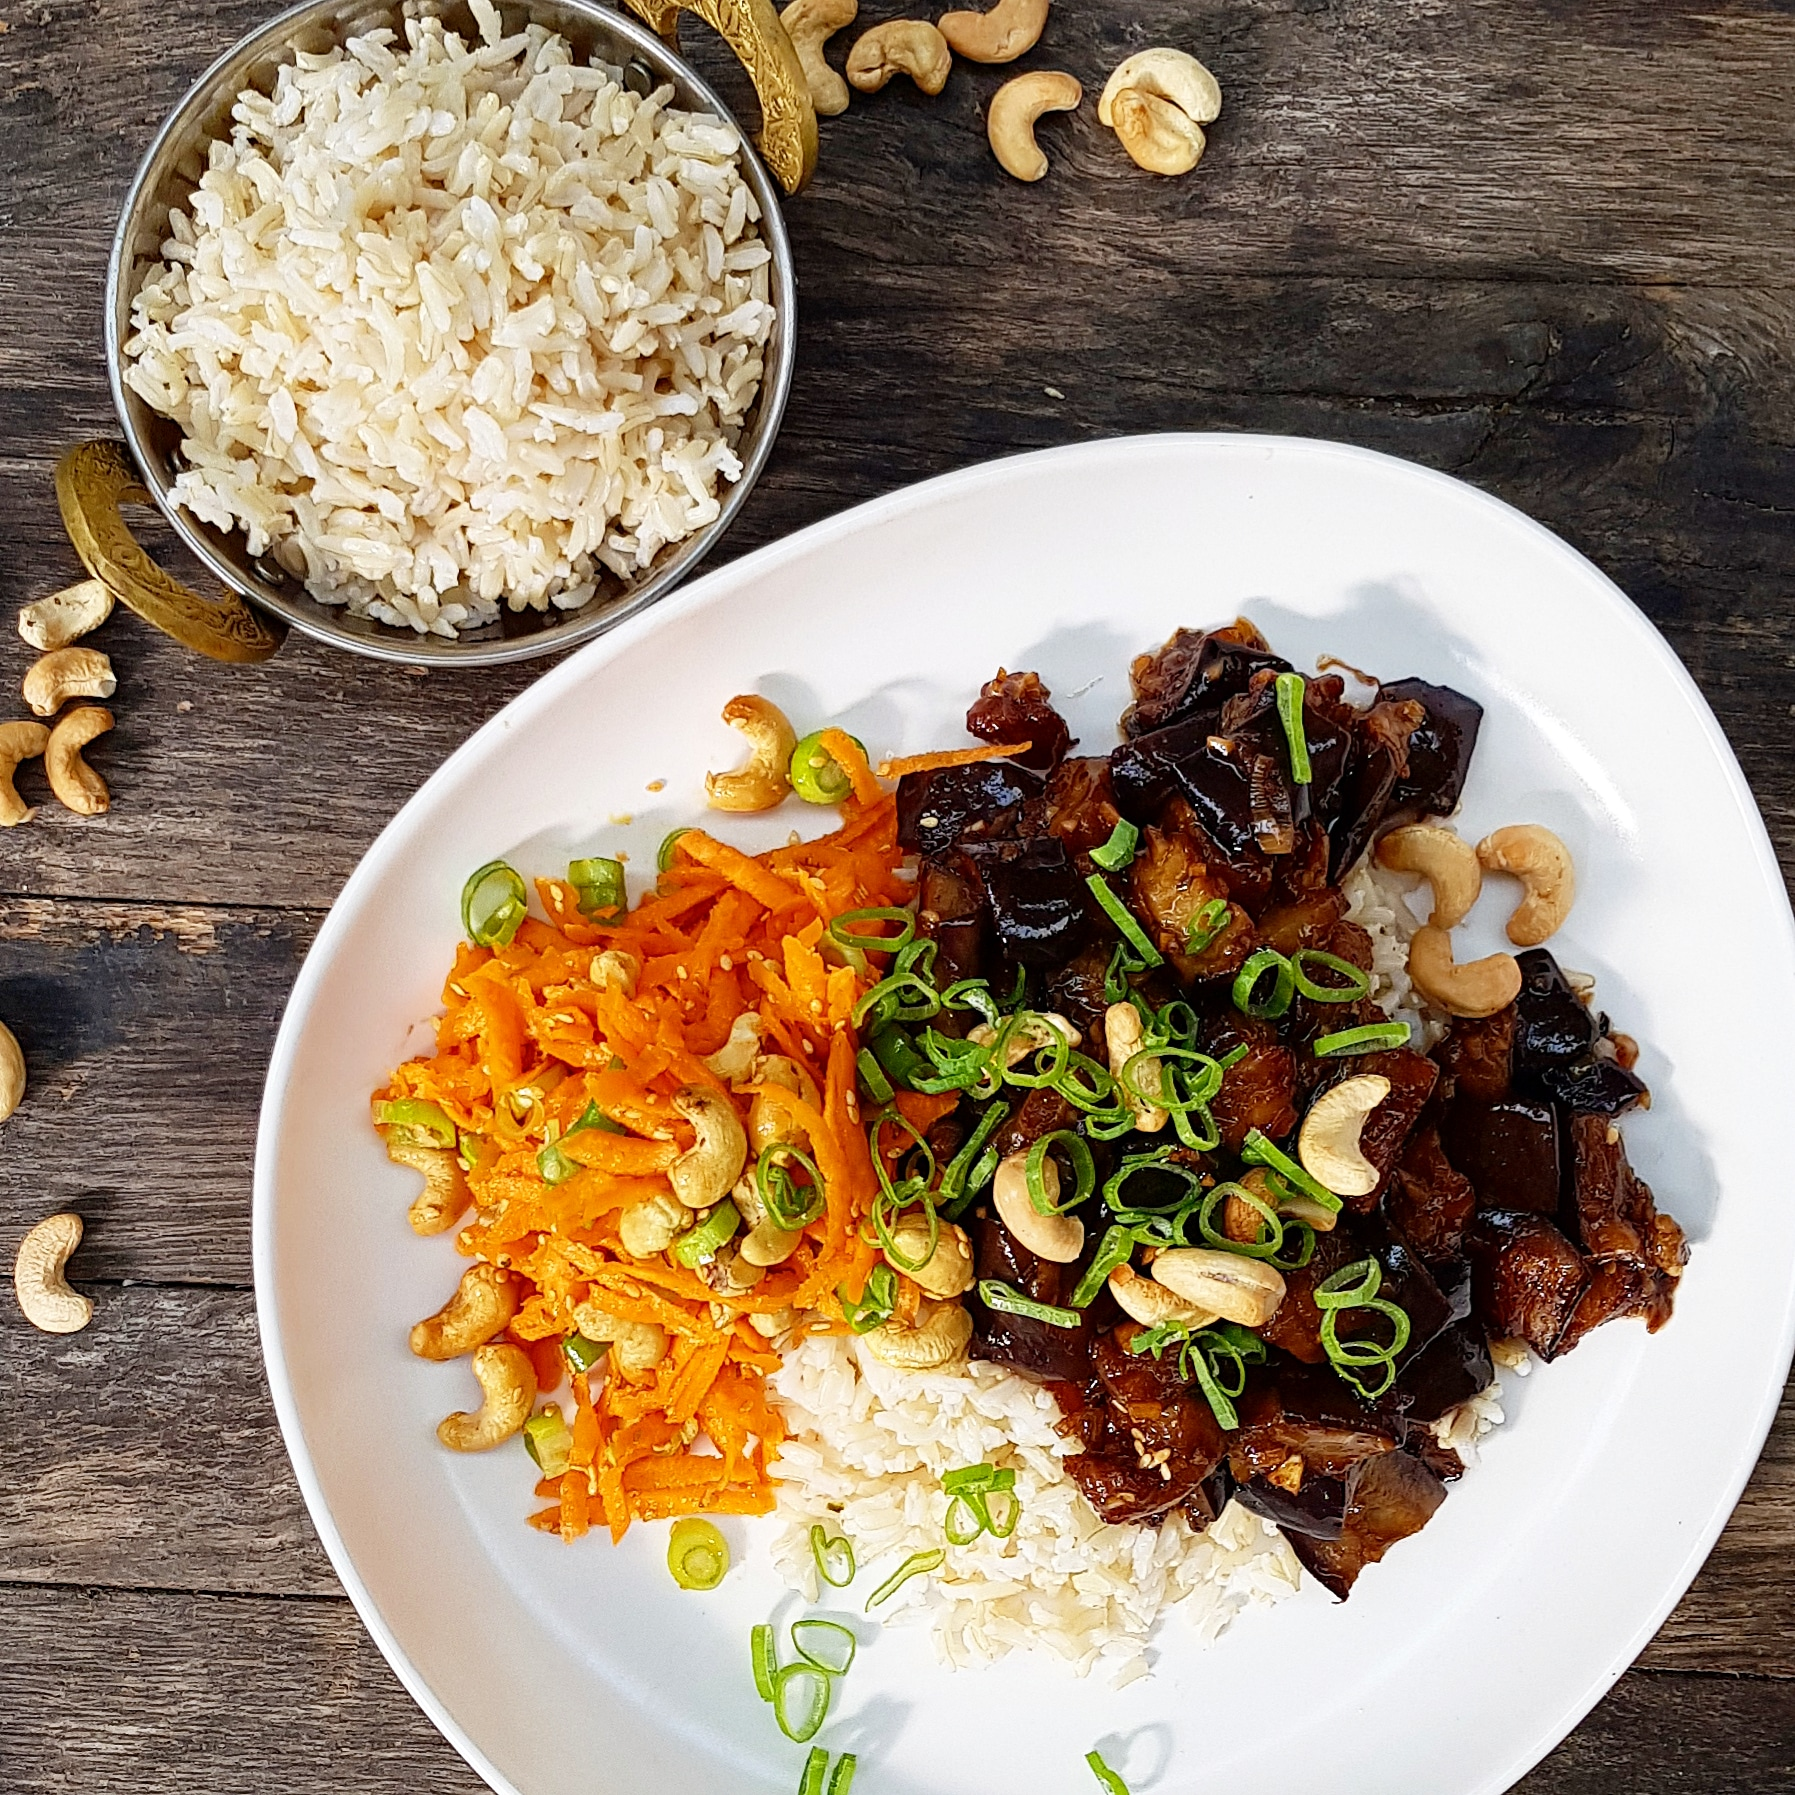 Eggplant and tamarind stir fry, kecap manis, carrot sesame slaw, brown rice and cashew